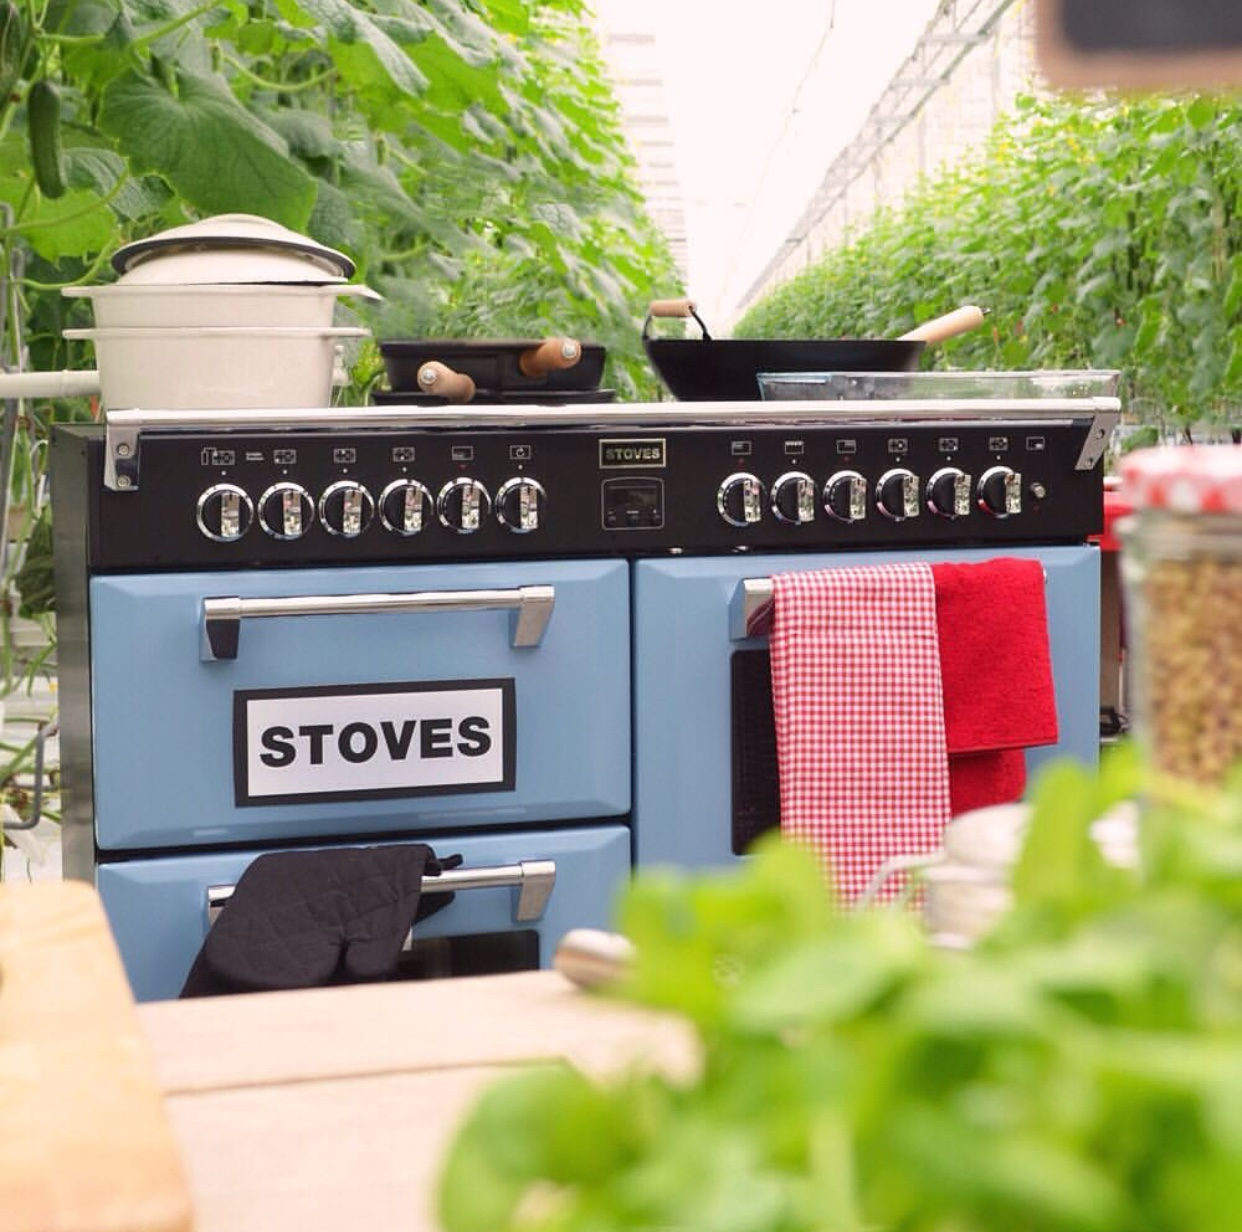 Stoves fornuis Richmond in kleur blauw - Uit Nederland proeft op RTL4 #fornuis #keukeninspiratie #gezienoptv #nederlandproeft #rtl4 #stovesfornujizen #kleurindekeuken